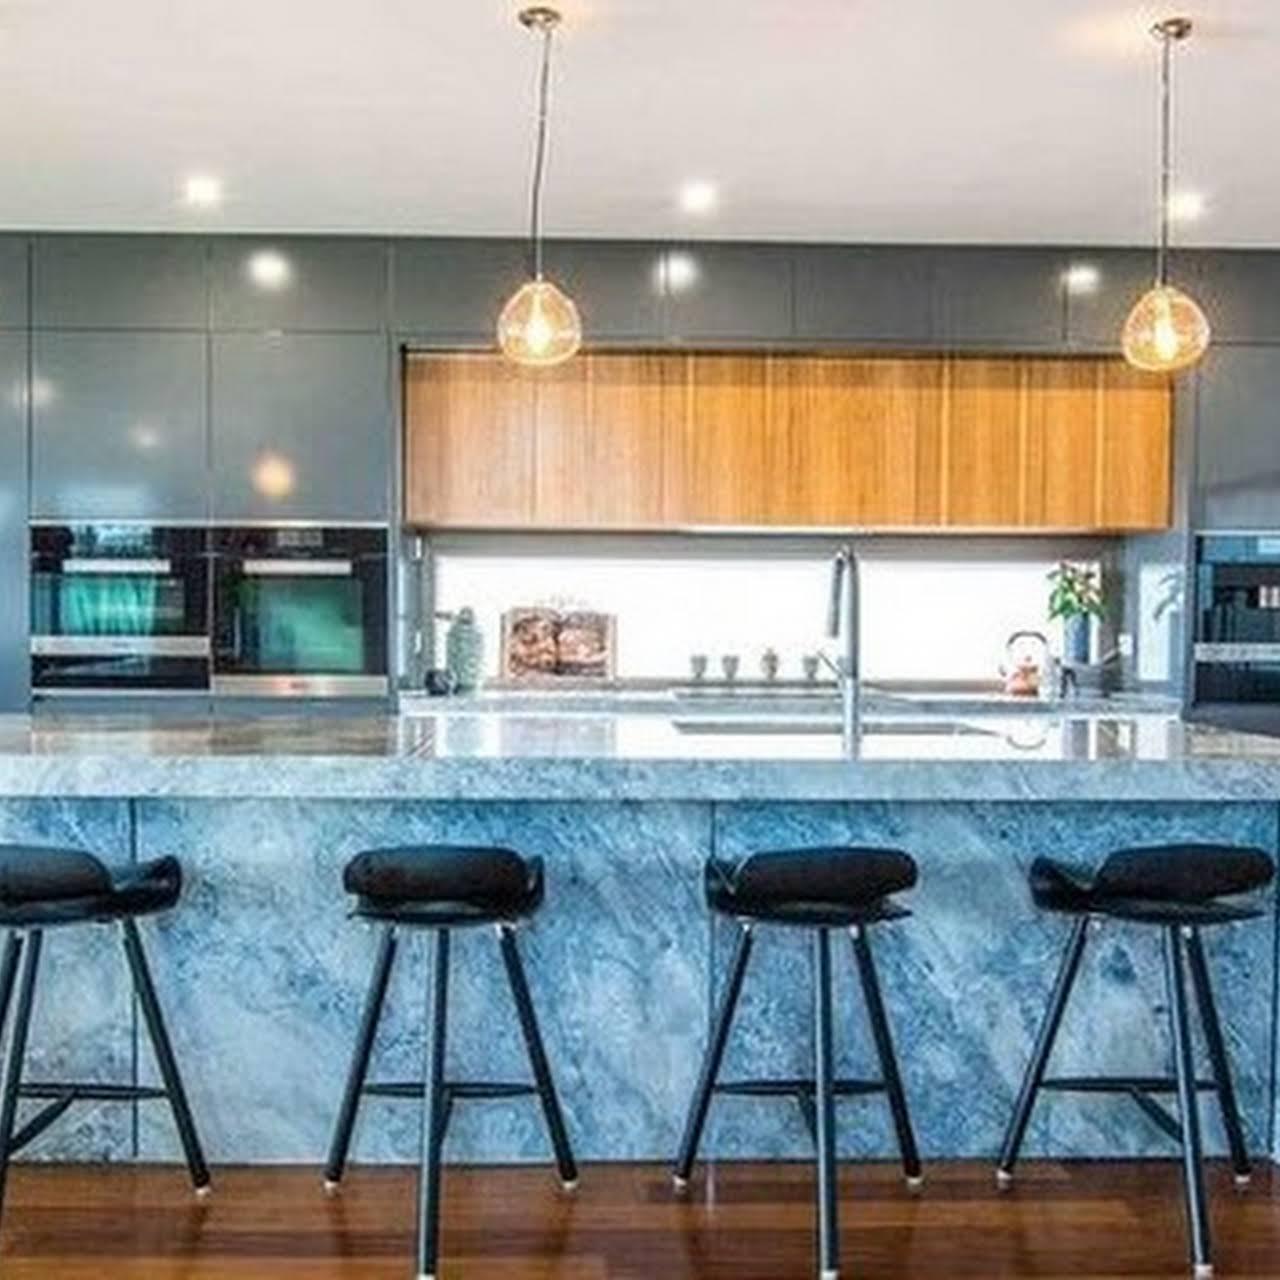 4 Kitchens - Award Winning Kitchens